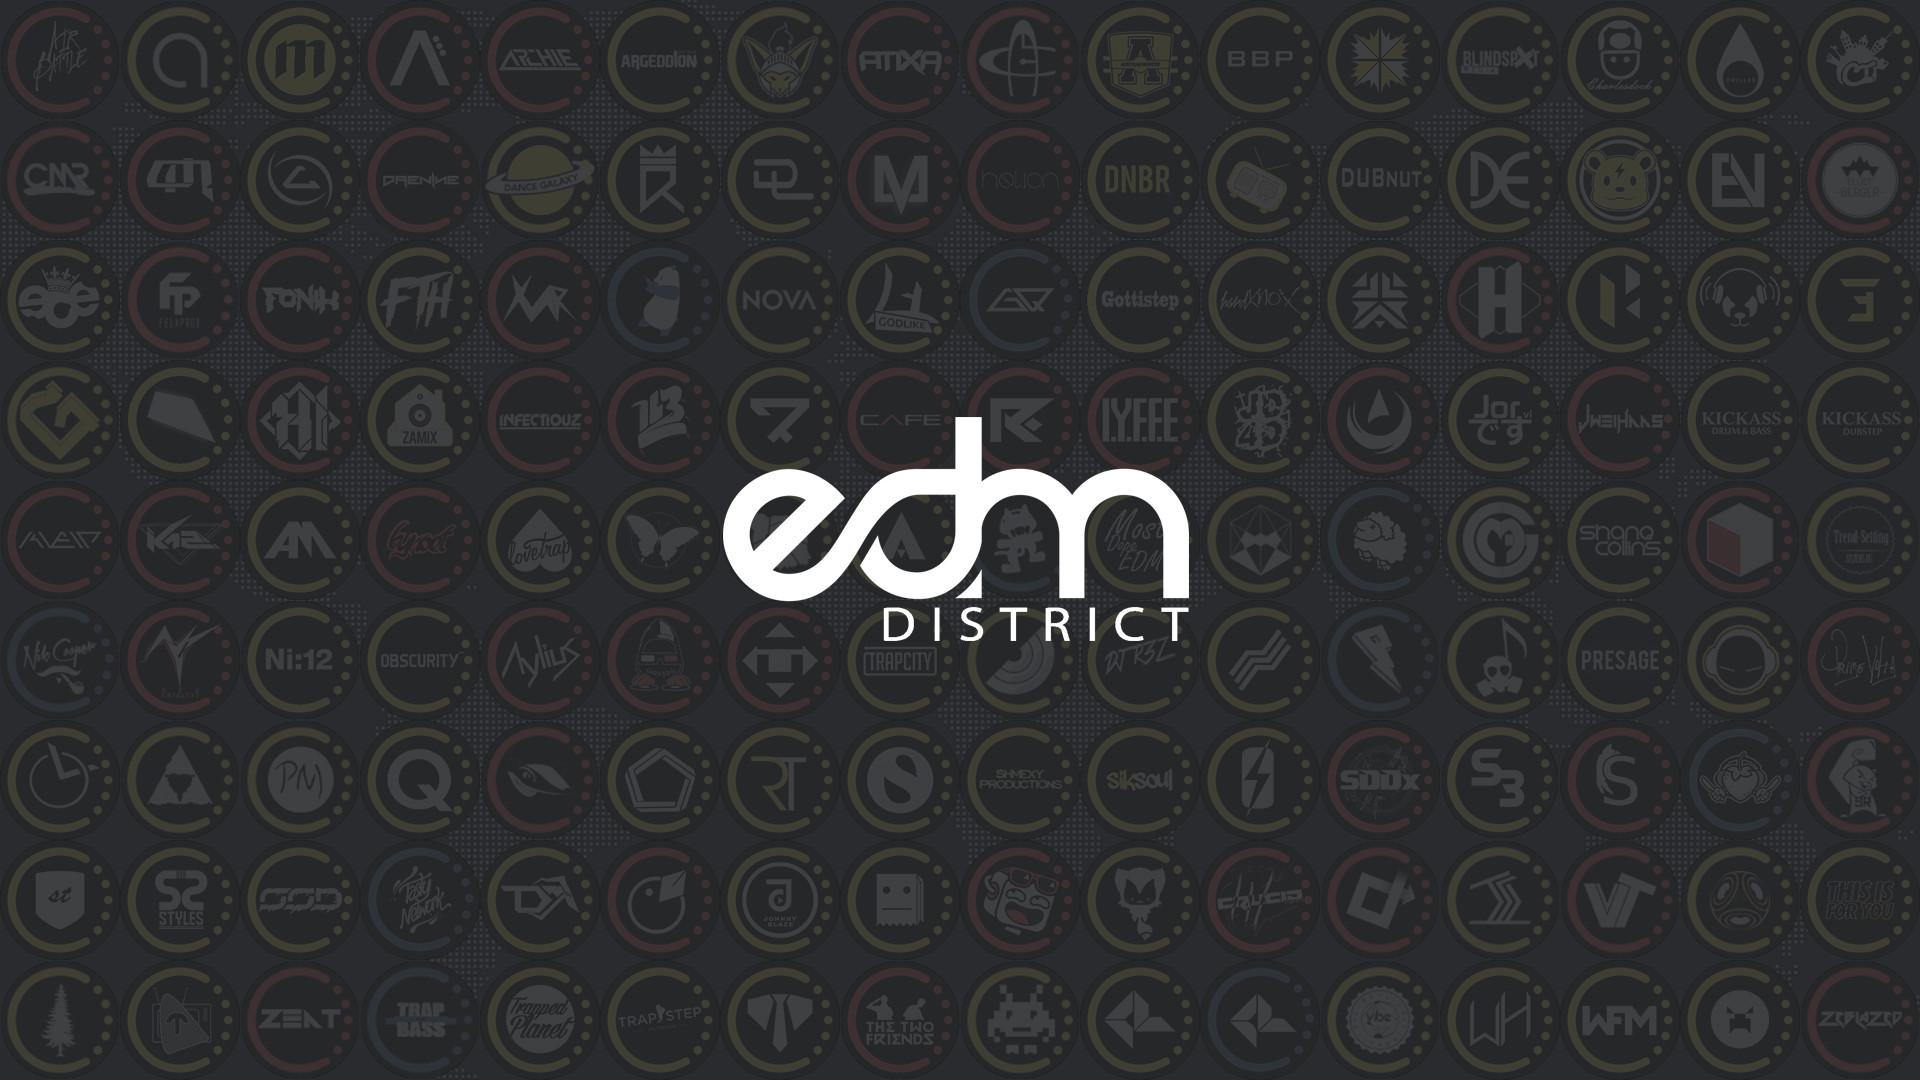 Edm Wallpaper Hd Iphhone Edm iphone bac…